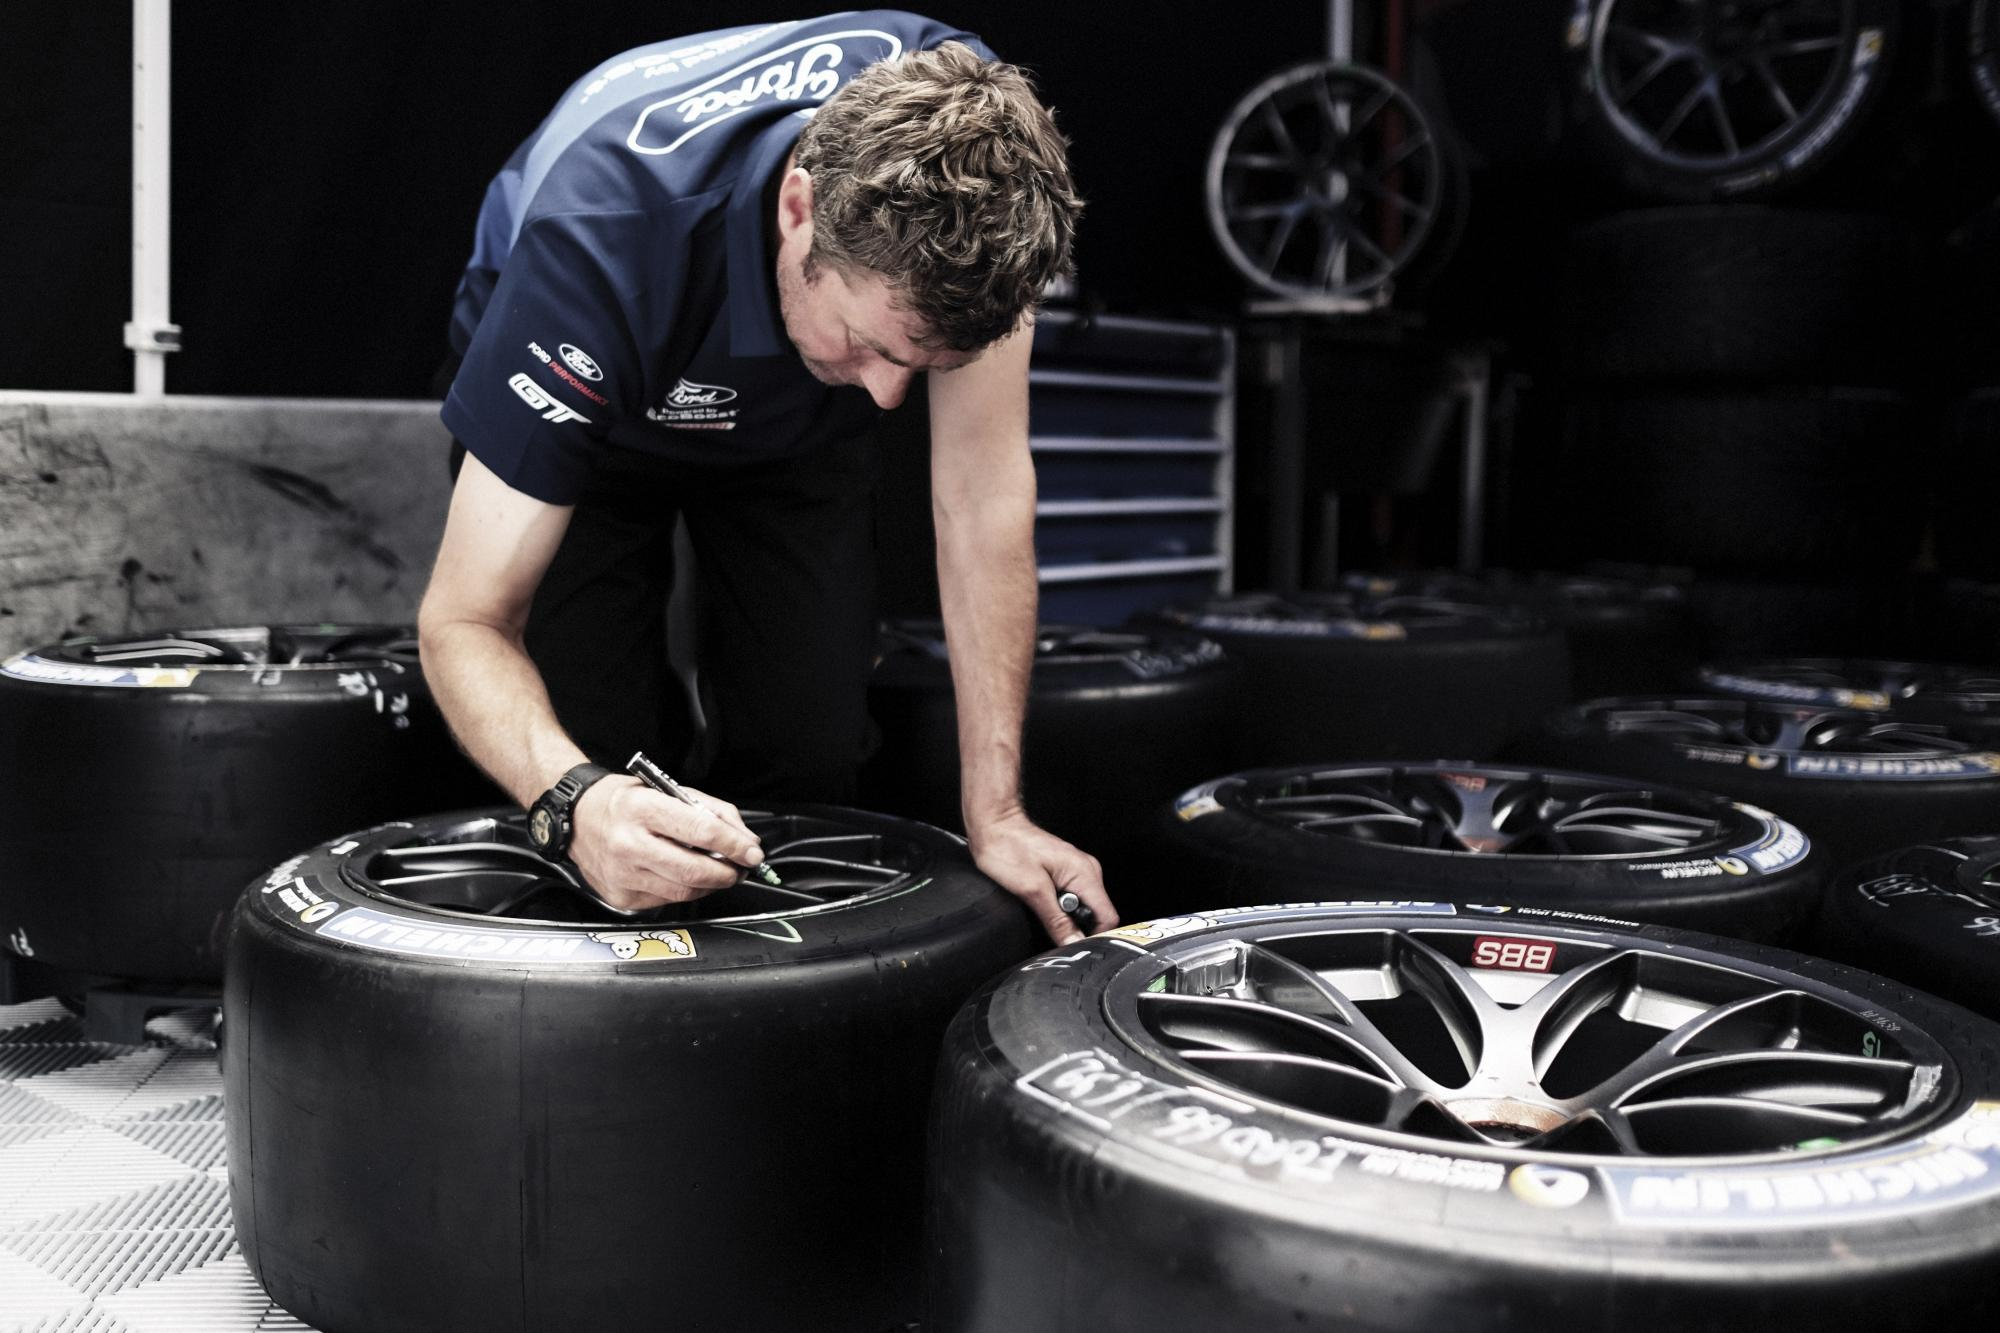 Почти половина участников гонки «24 часа Ле-Мана» 2017 года поедут на шинах Michelin